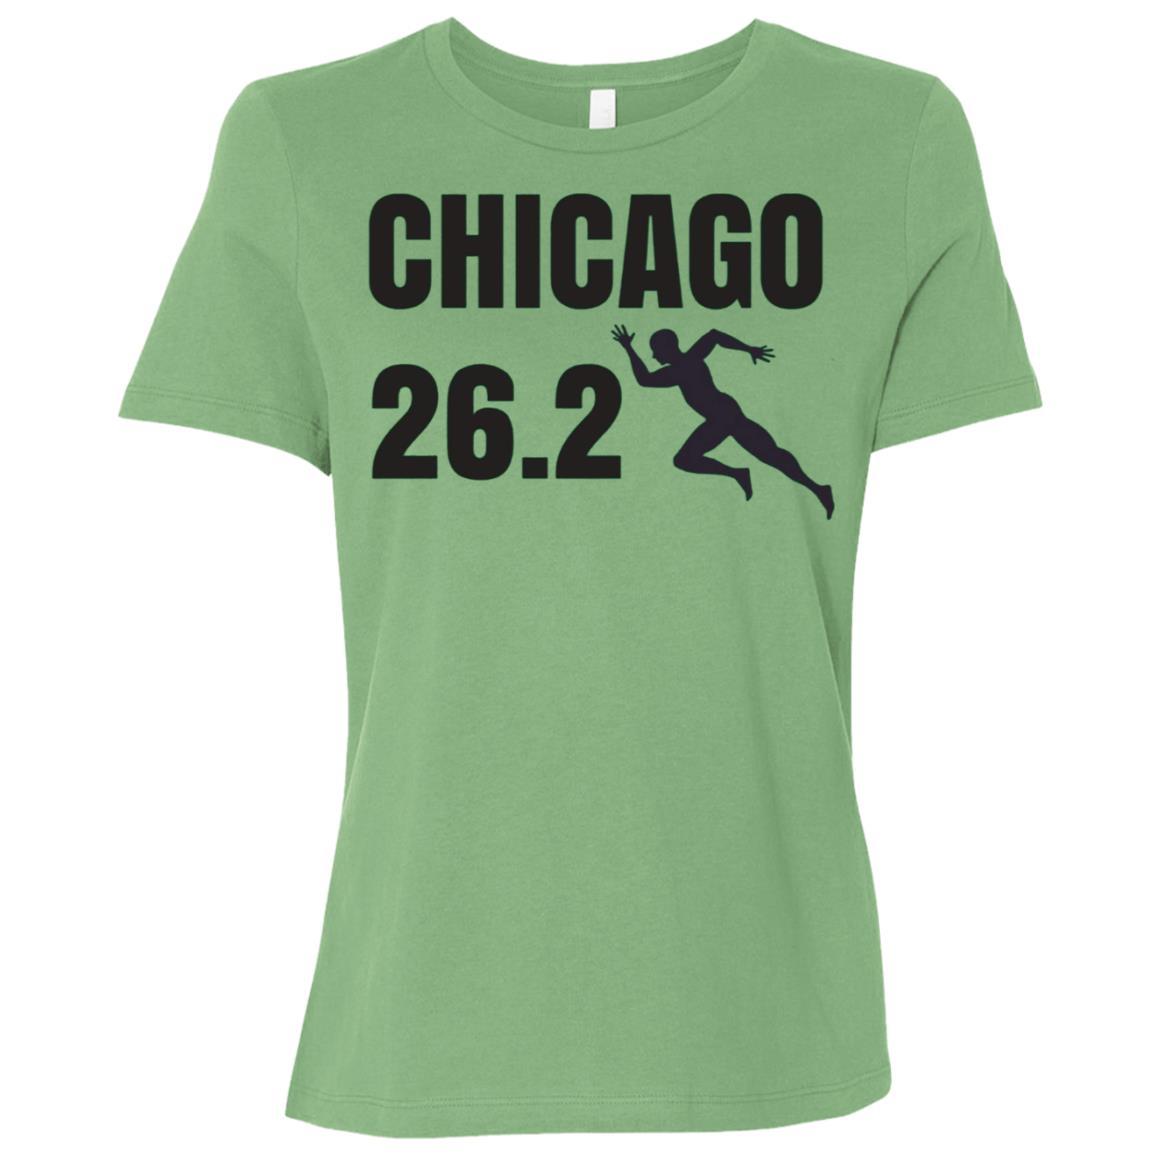 Chicago 26.2 Miles Marathon Running Women Short Sleeve T-Shirt